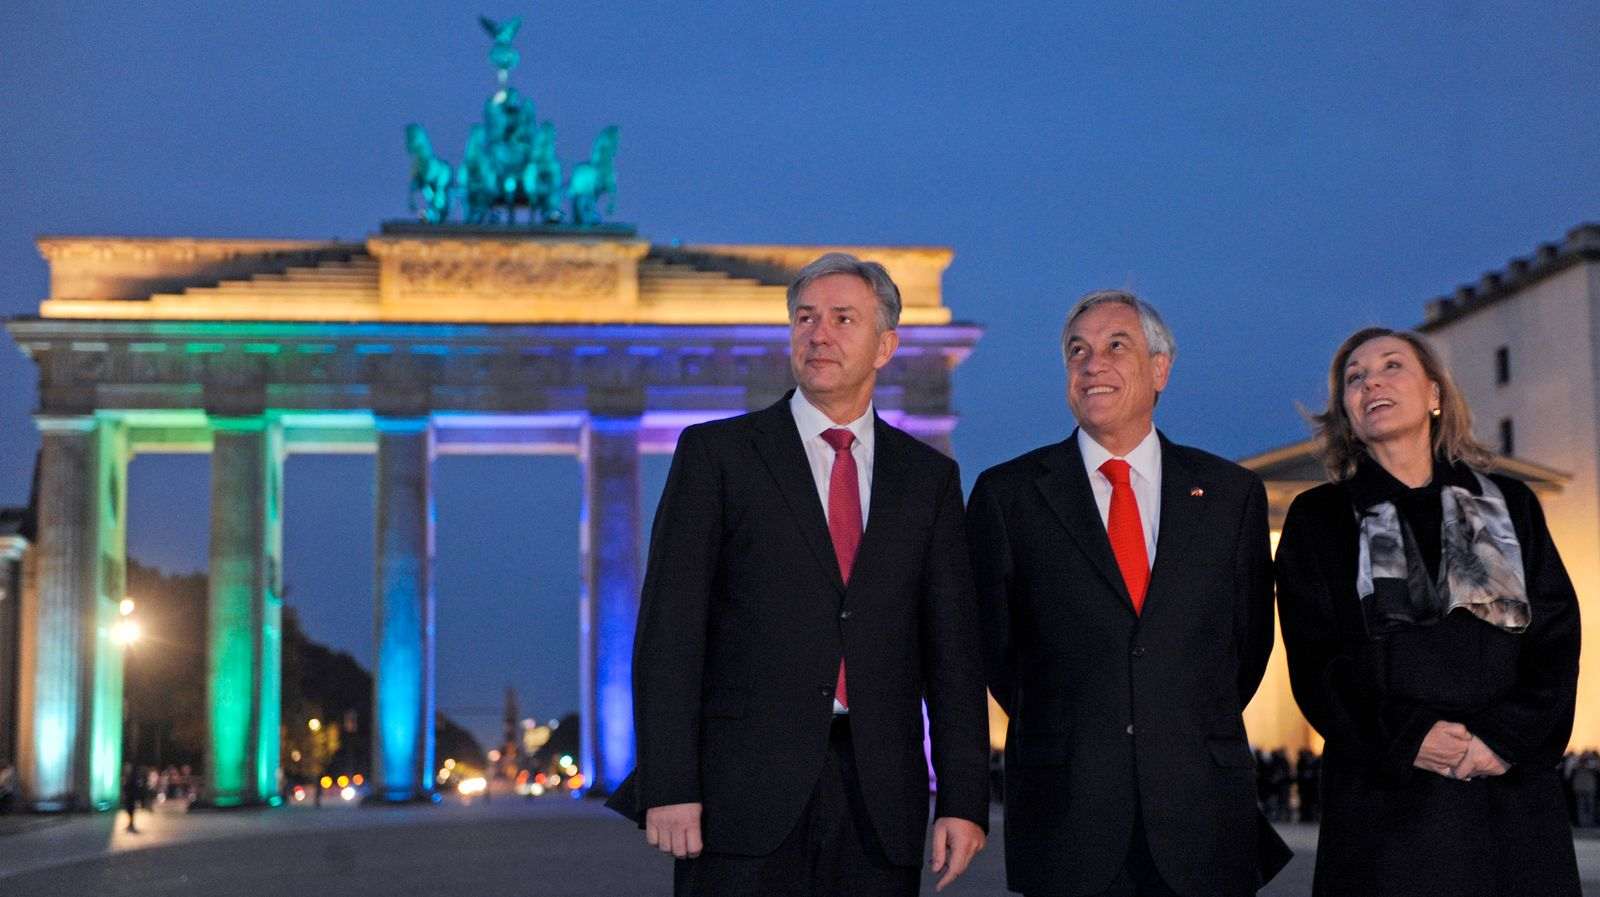 Berlin / Regierender Bürgermeister Klaus Wowereit